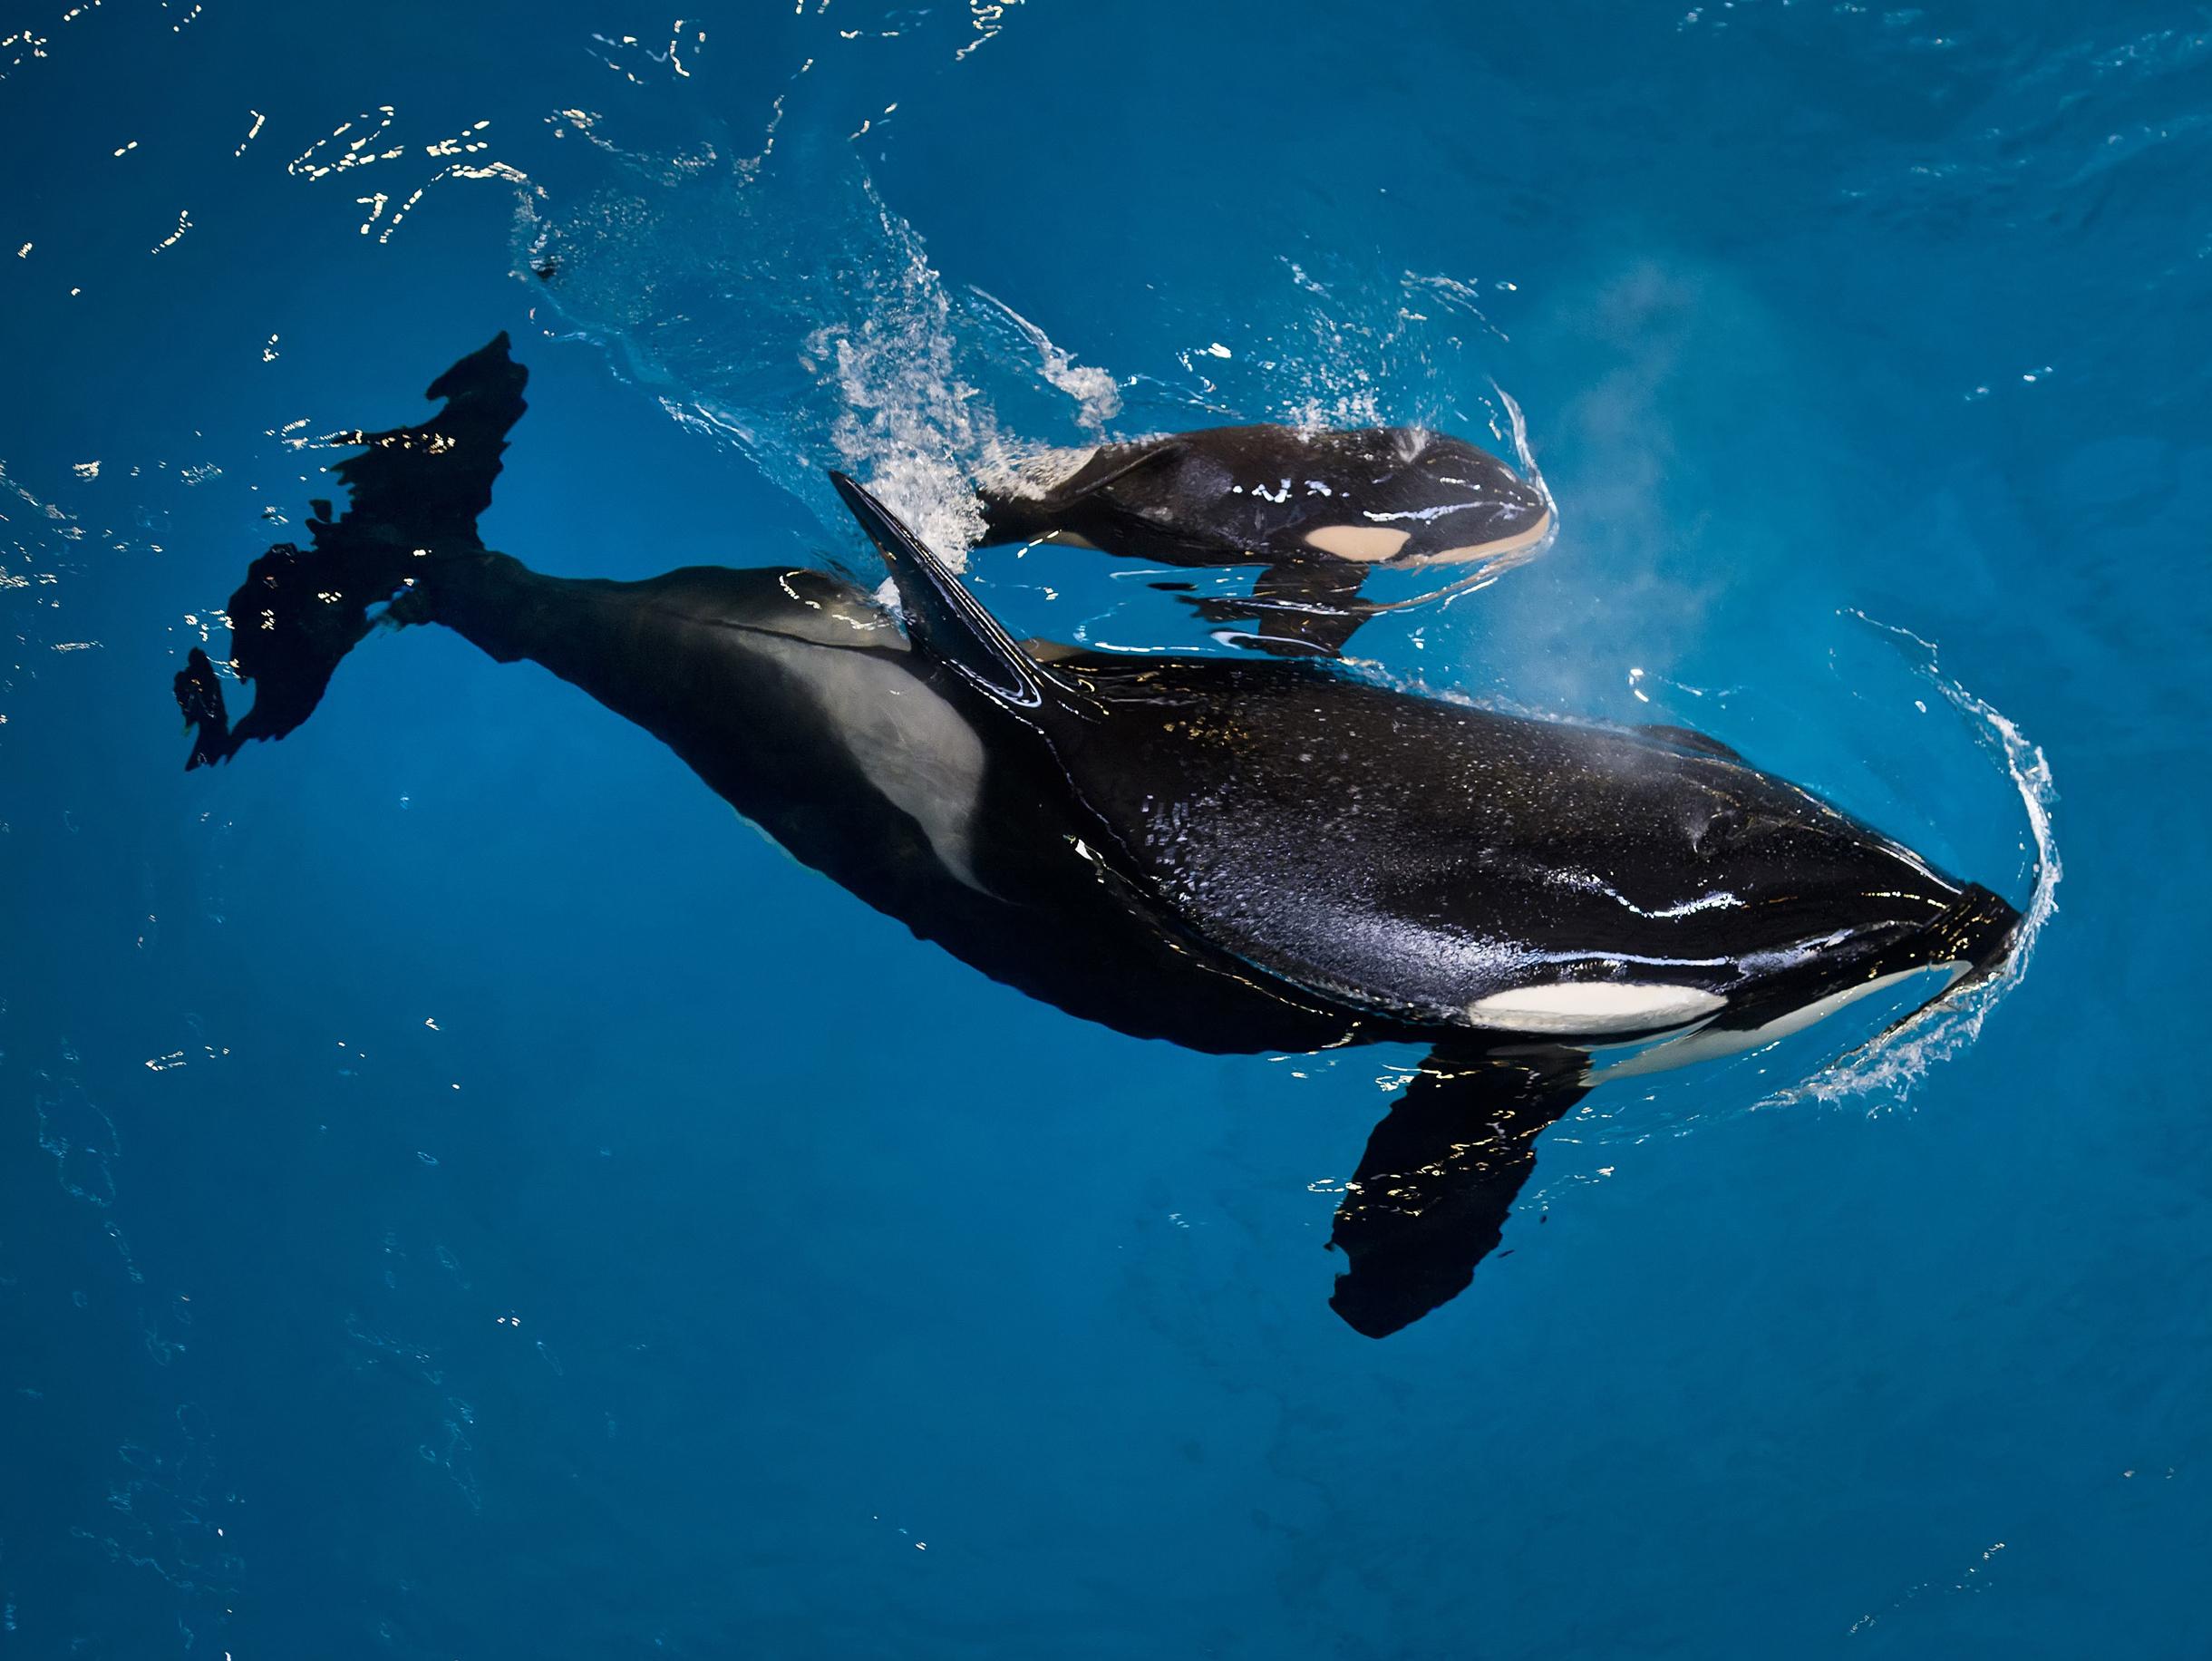 SeaWorld's-Last-Baby-Killer-Whale-Born-at-Texas-Park